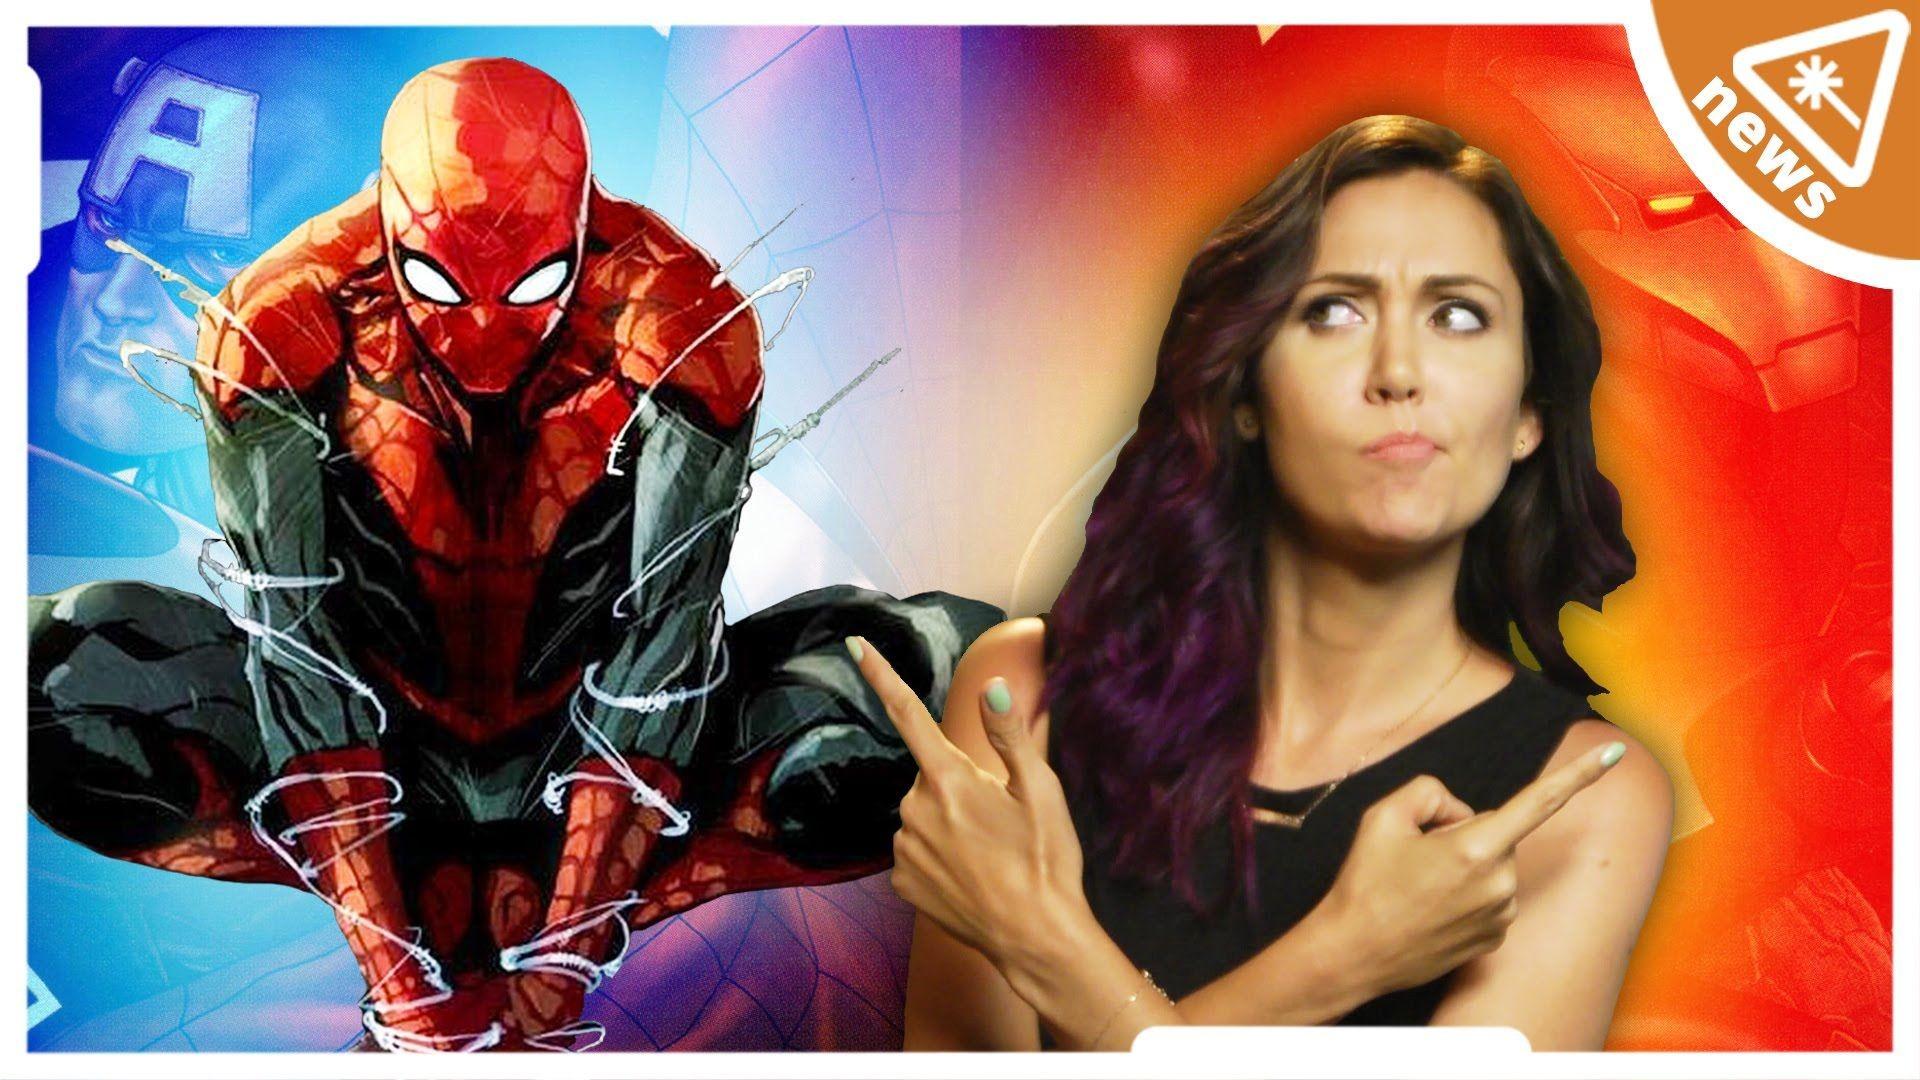 Res: 1920x1080, How Will the Hulk Affect the THOR: RAGNAROK Plot?? (Nerdist News w/ Jessica  Chobot) | Jessica chobot and Thor